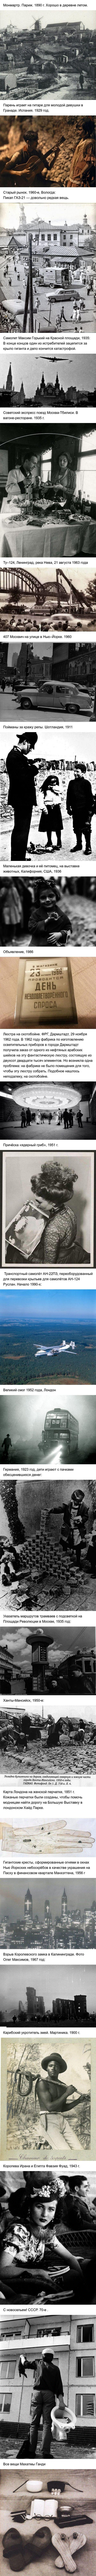 Снимки разных времен и эпох. махатма ганди, Нью-Йорк, Москва, ФРГ, Лондон, кража, длиннопост, москвич